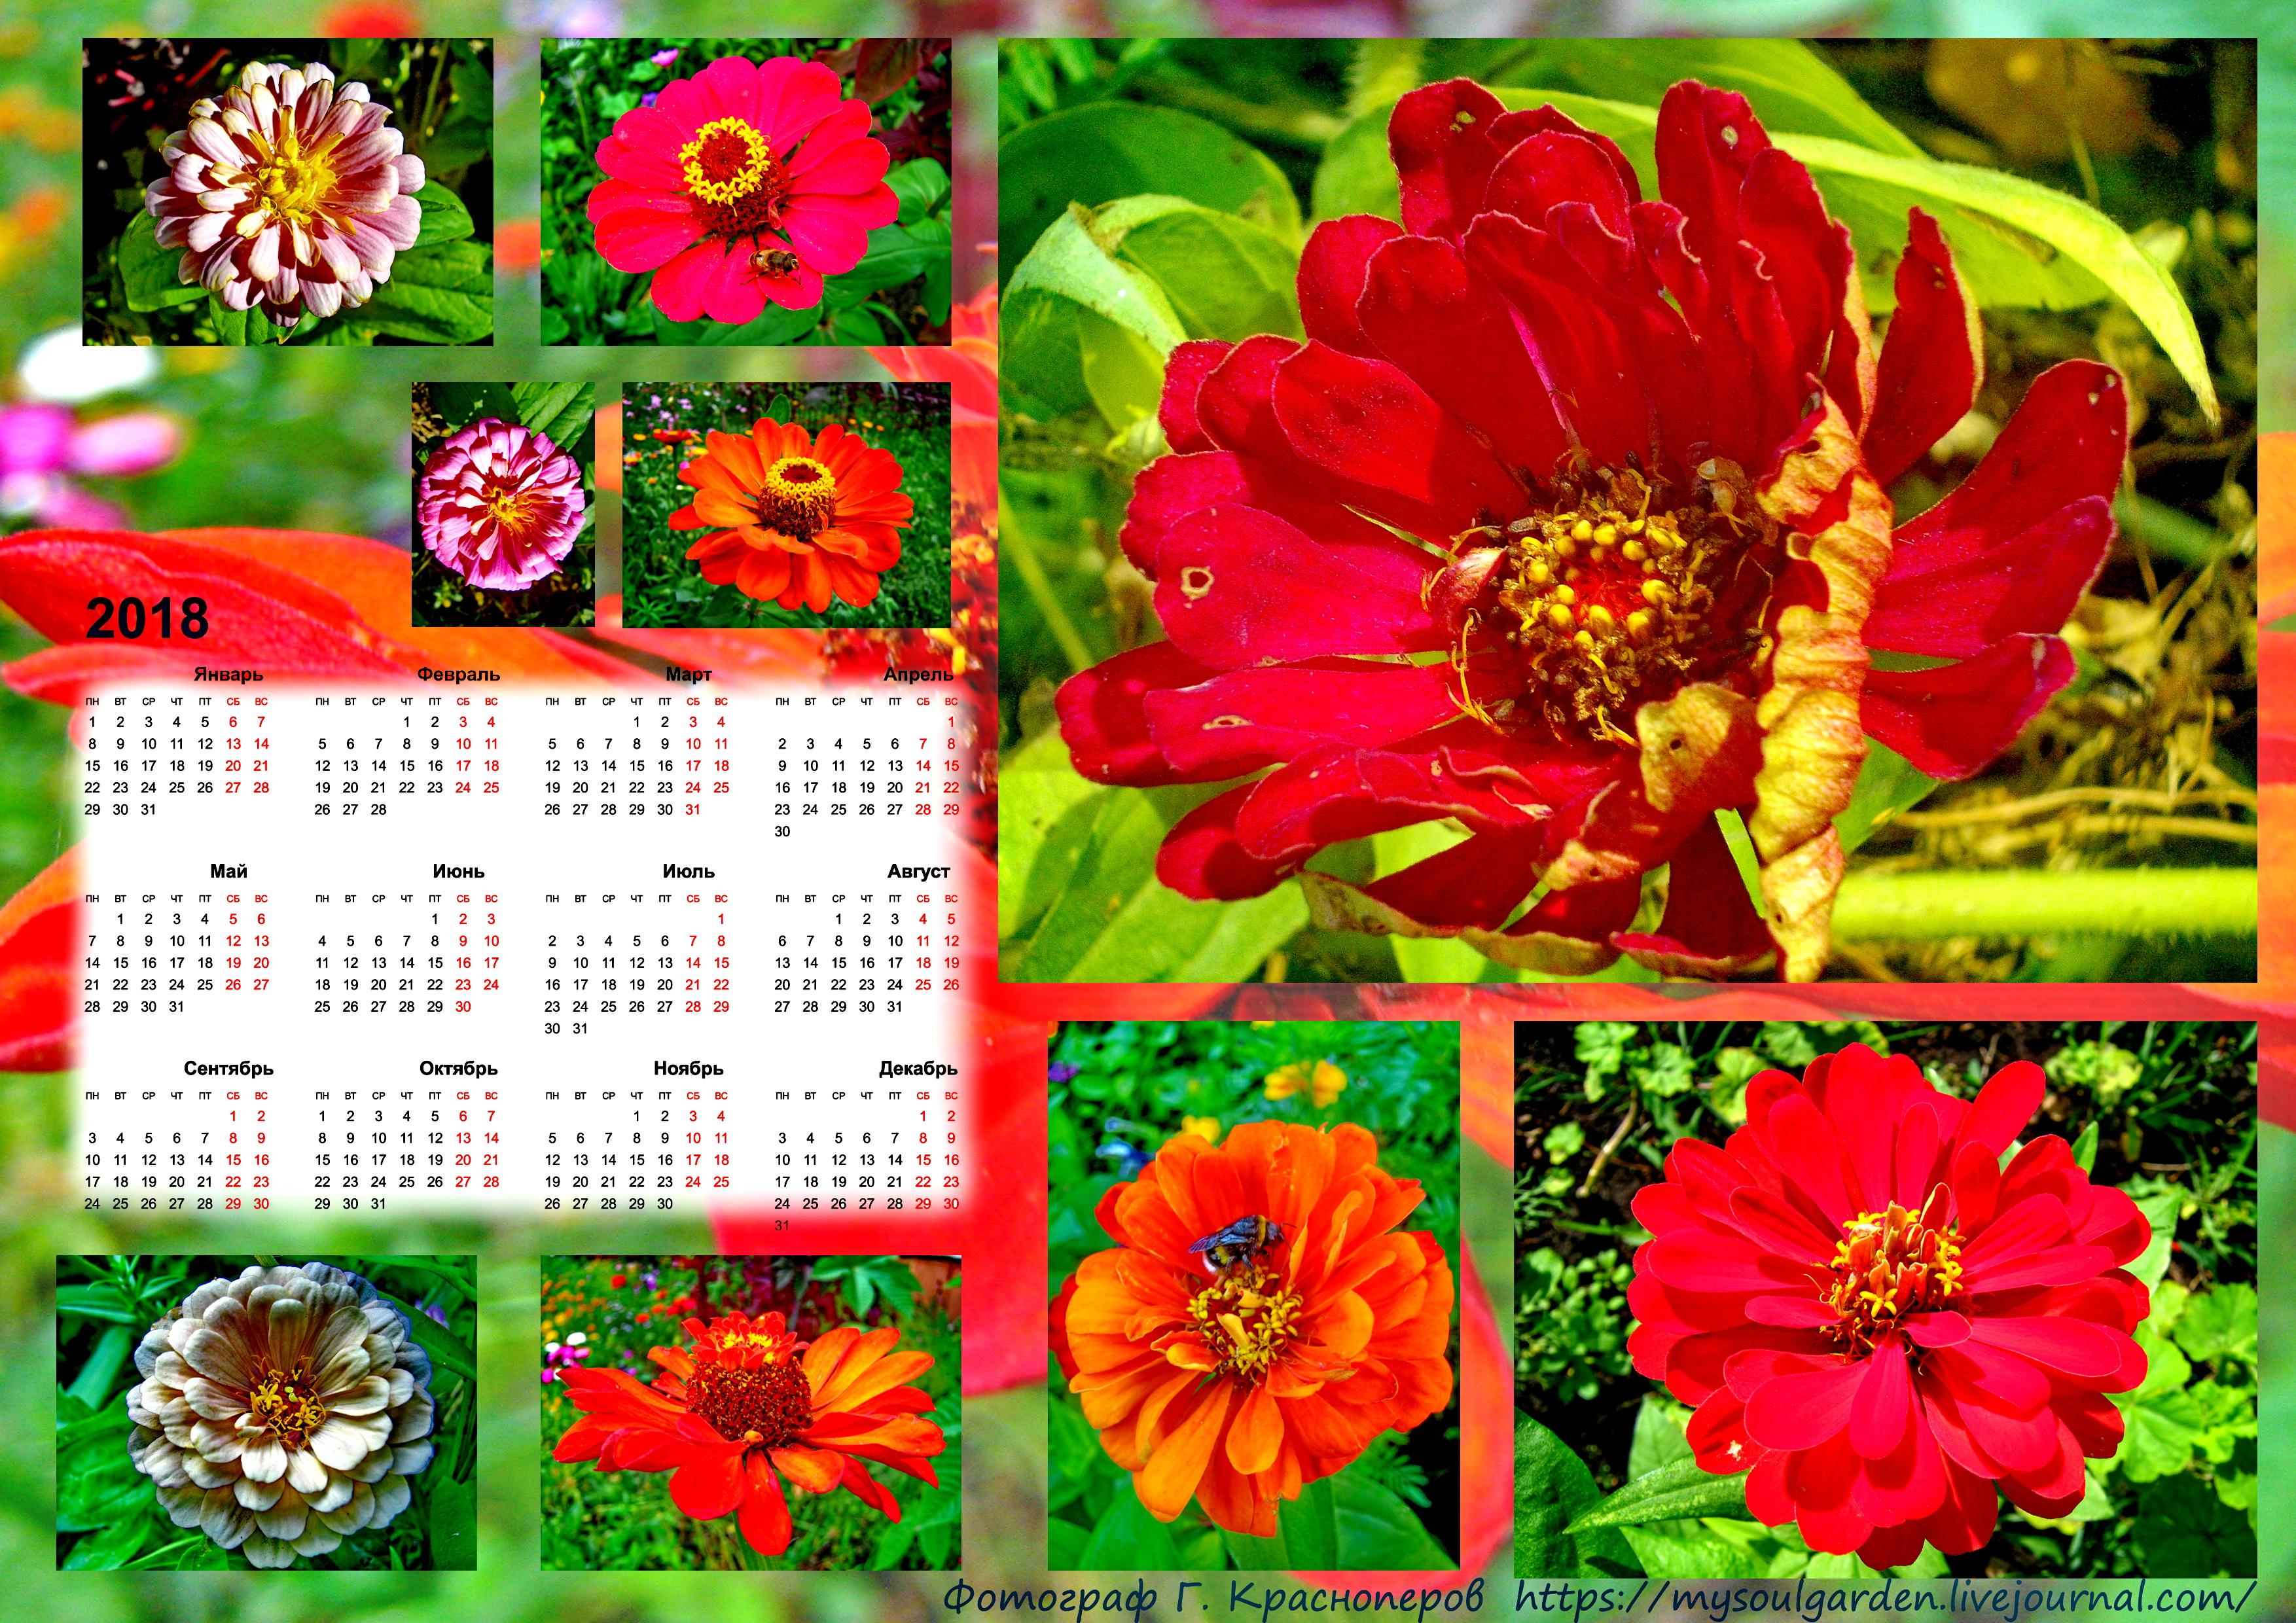 Календарь-2018 с Цинниями.jpg